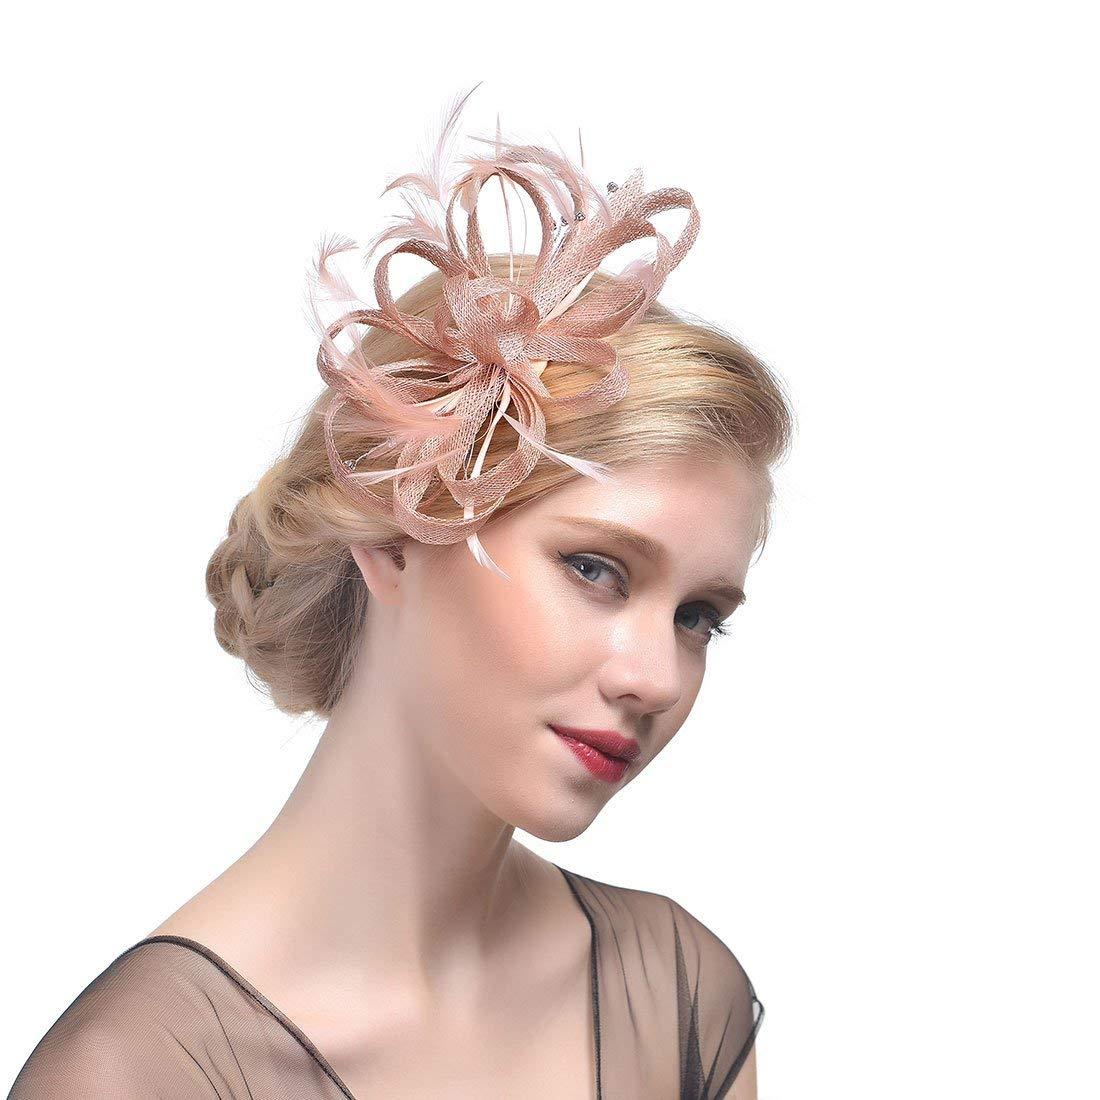 3067d6d568f05 Get Quotations · Canvalite Hat Sinamay Vintage Kentucky Derby Hat Women  Fascinator Headdress